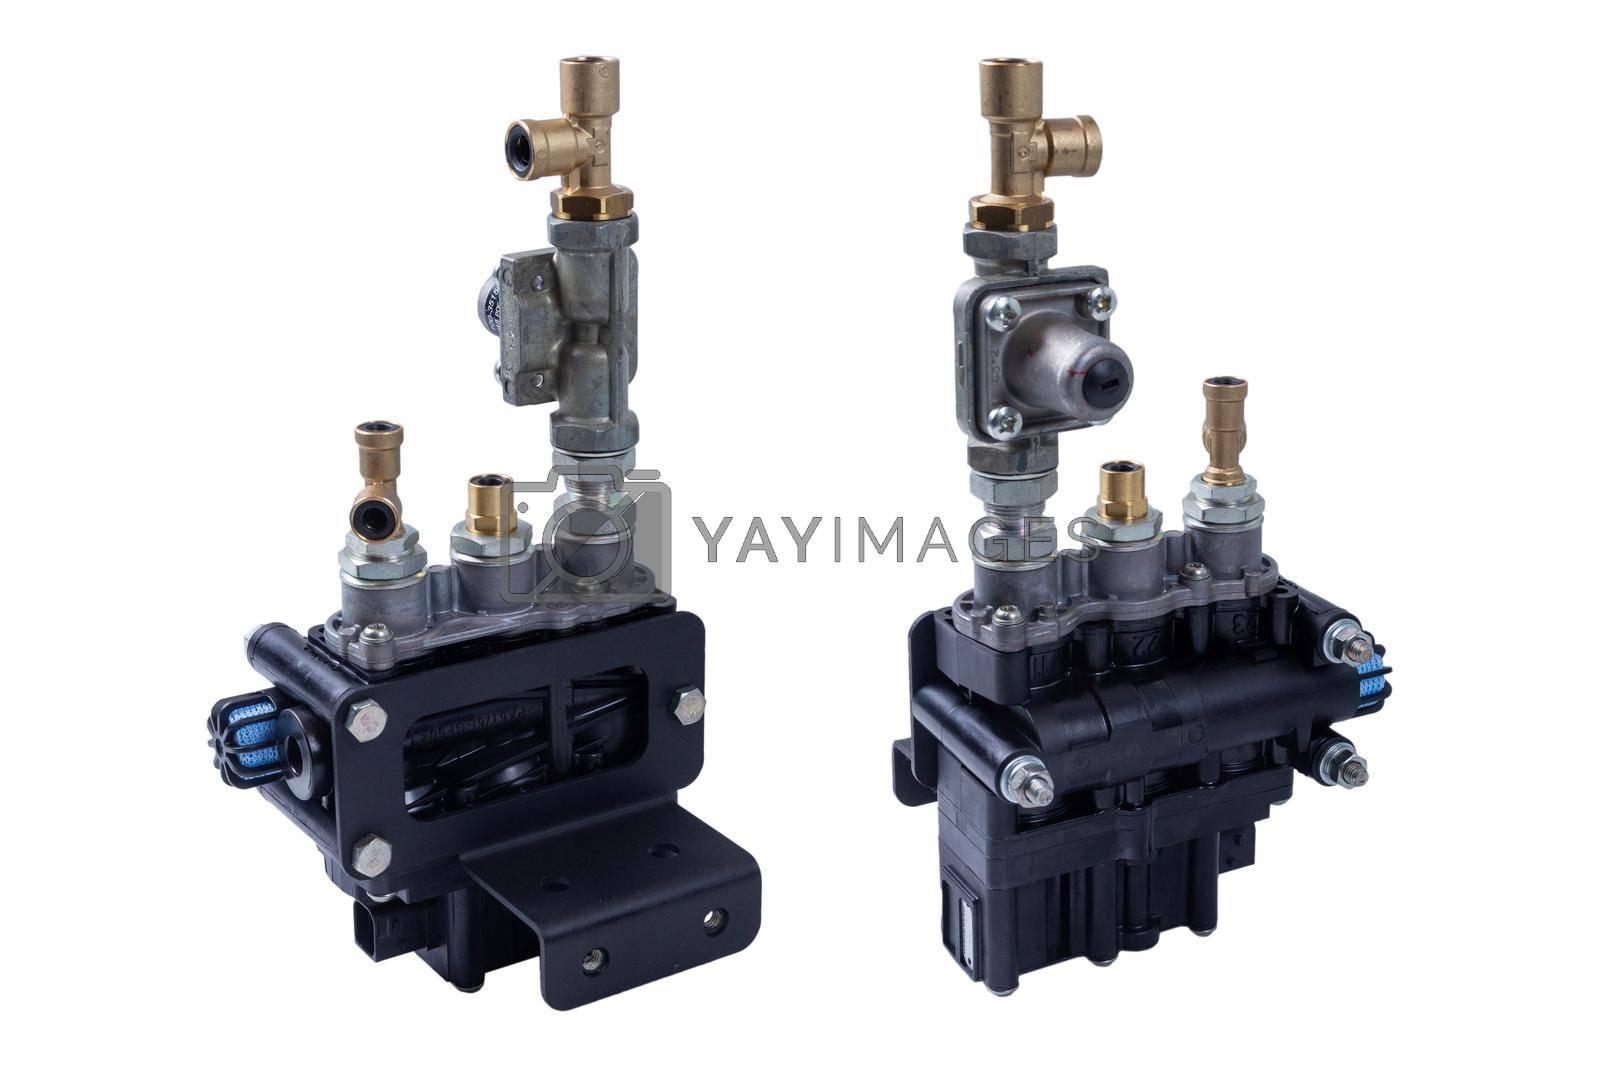 Engine Pneumatic system solenoid valve